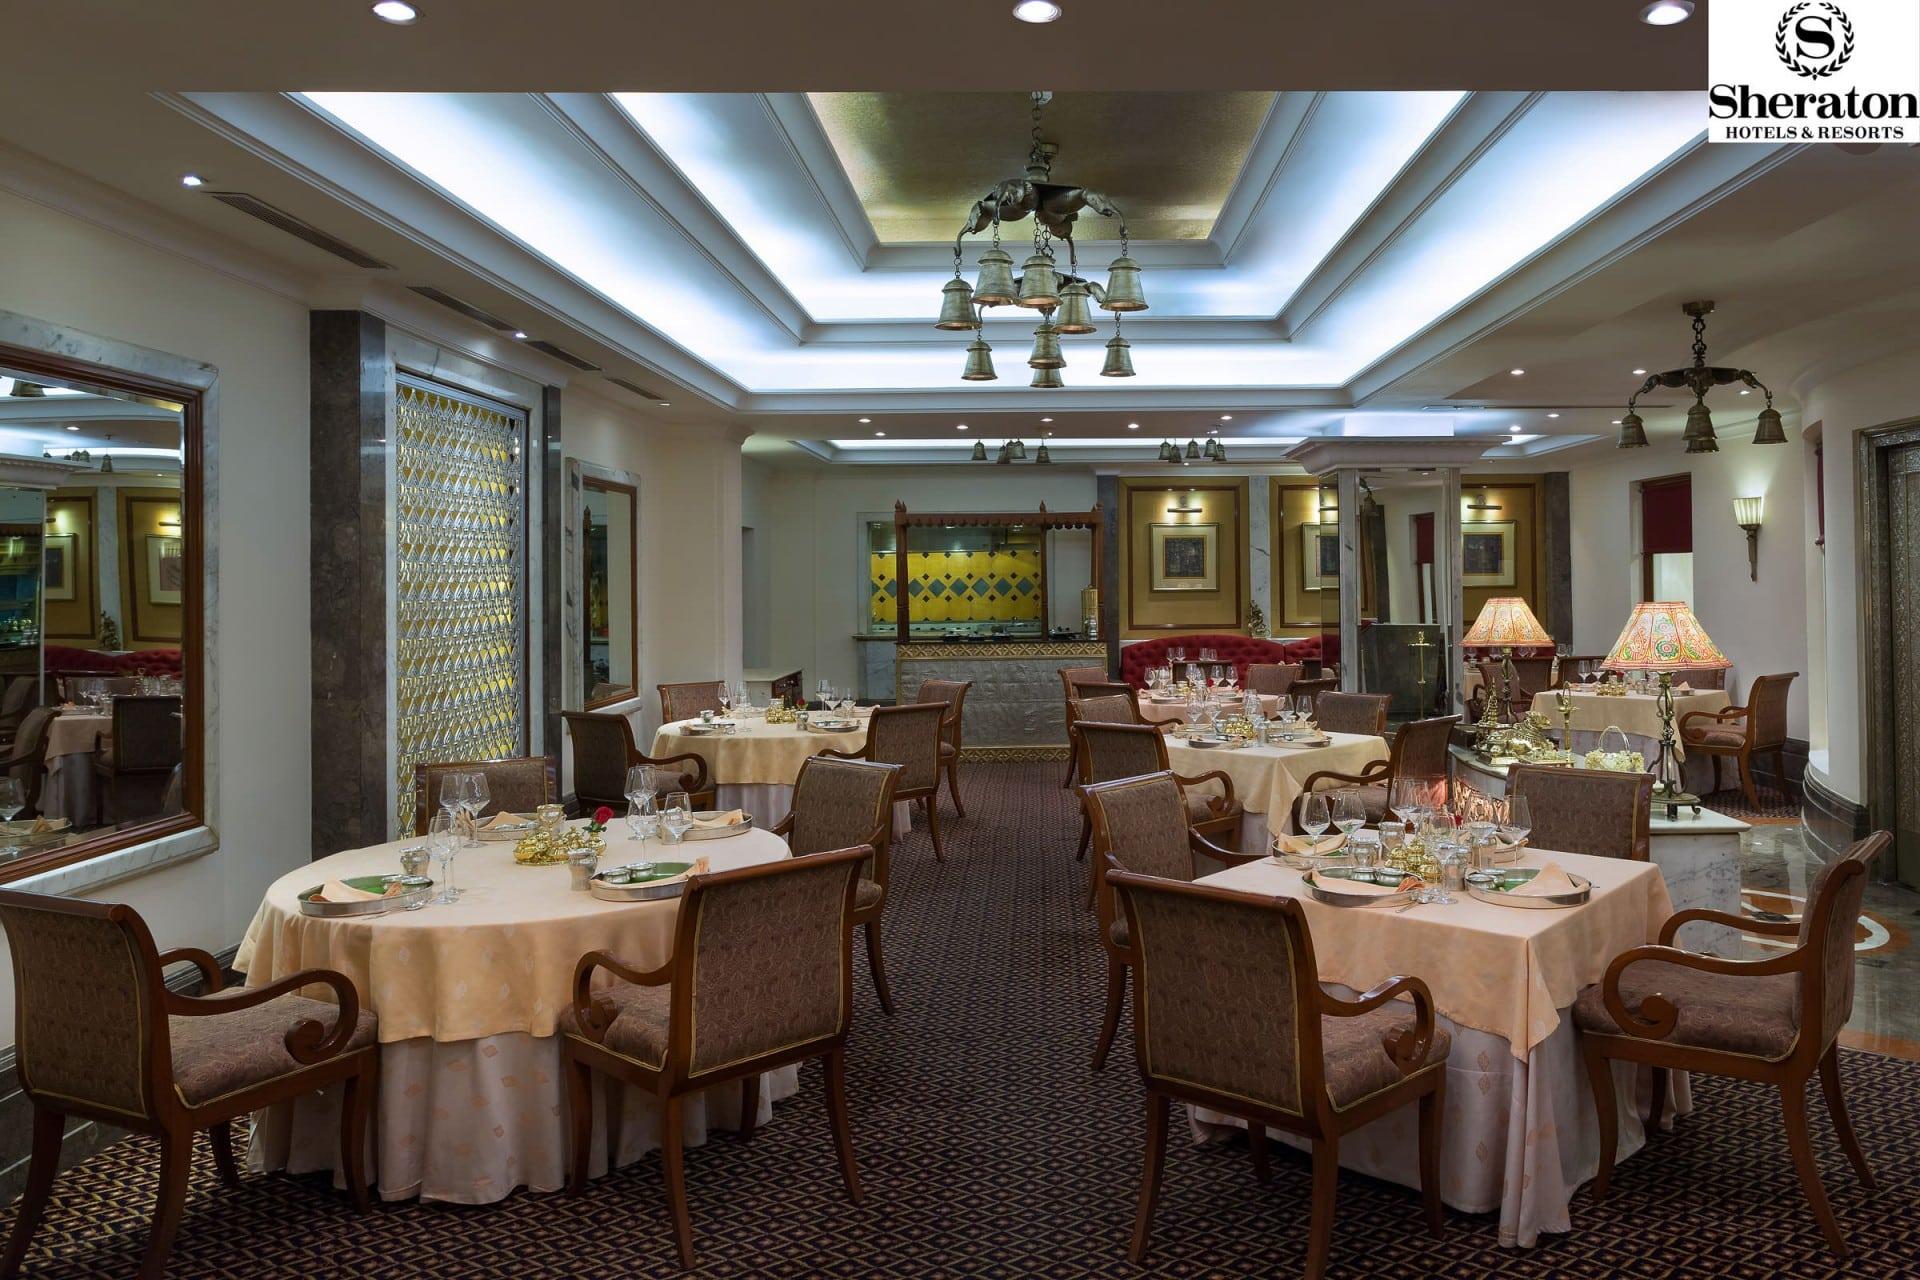 Architecture Photographer New Delhi India   Sheraton Restaurant Hotel Photography